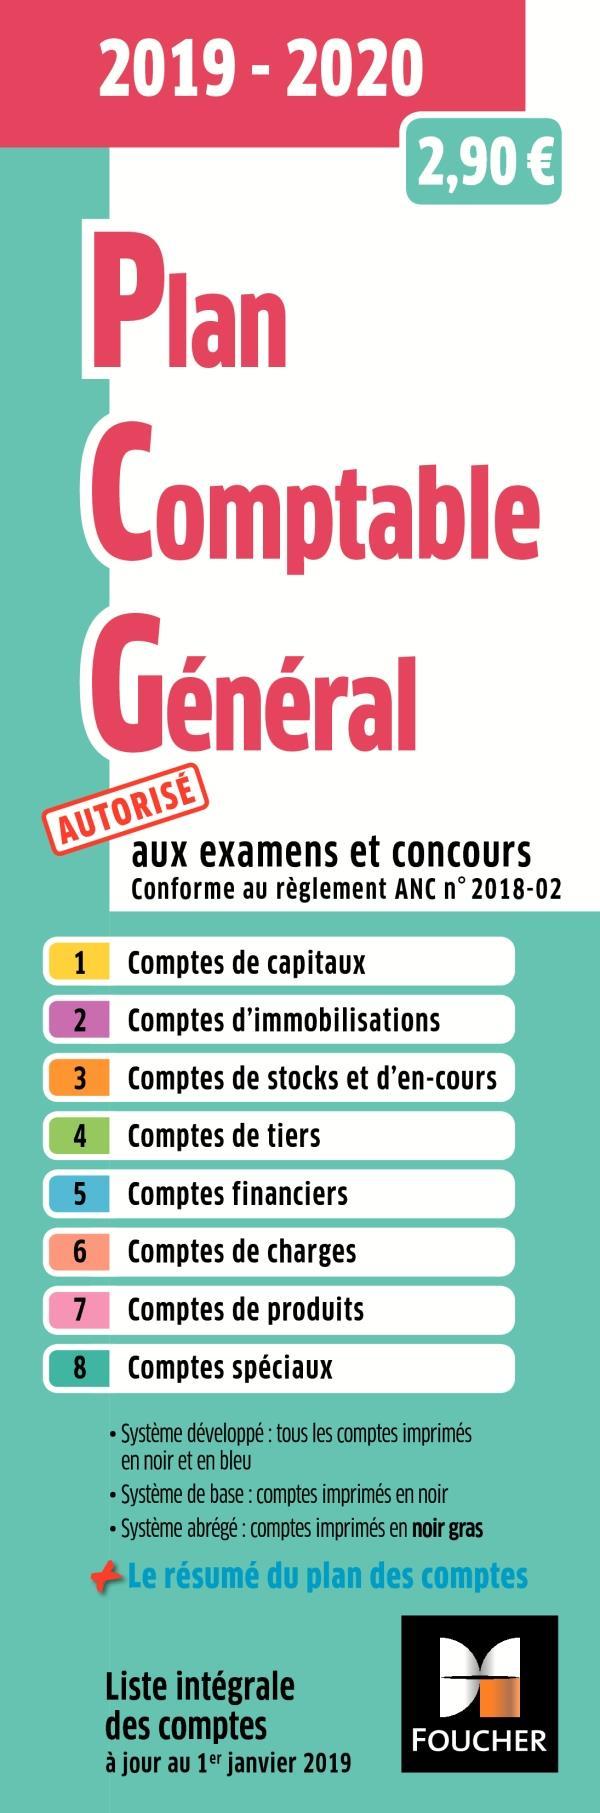 PLAN COMPTABLE GENERAL - PCG - 2019-2020